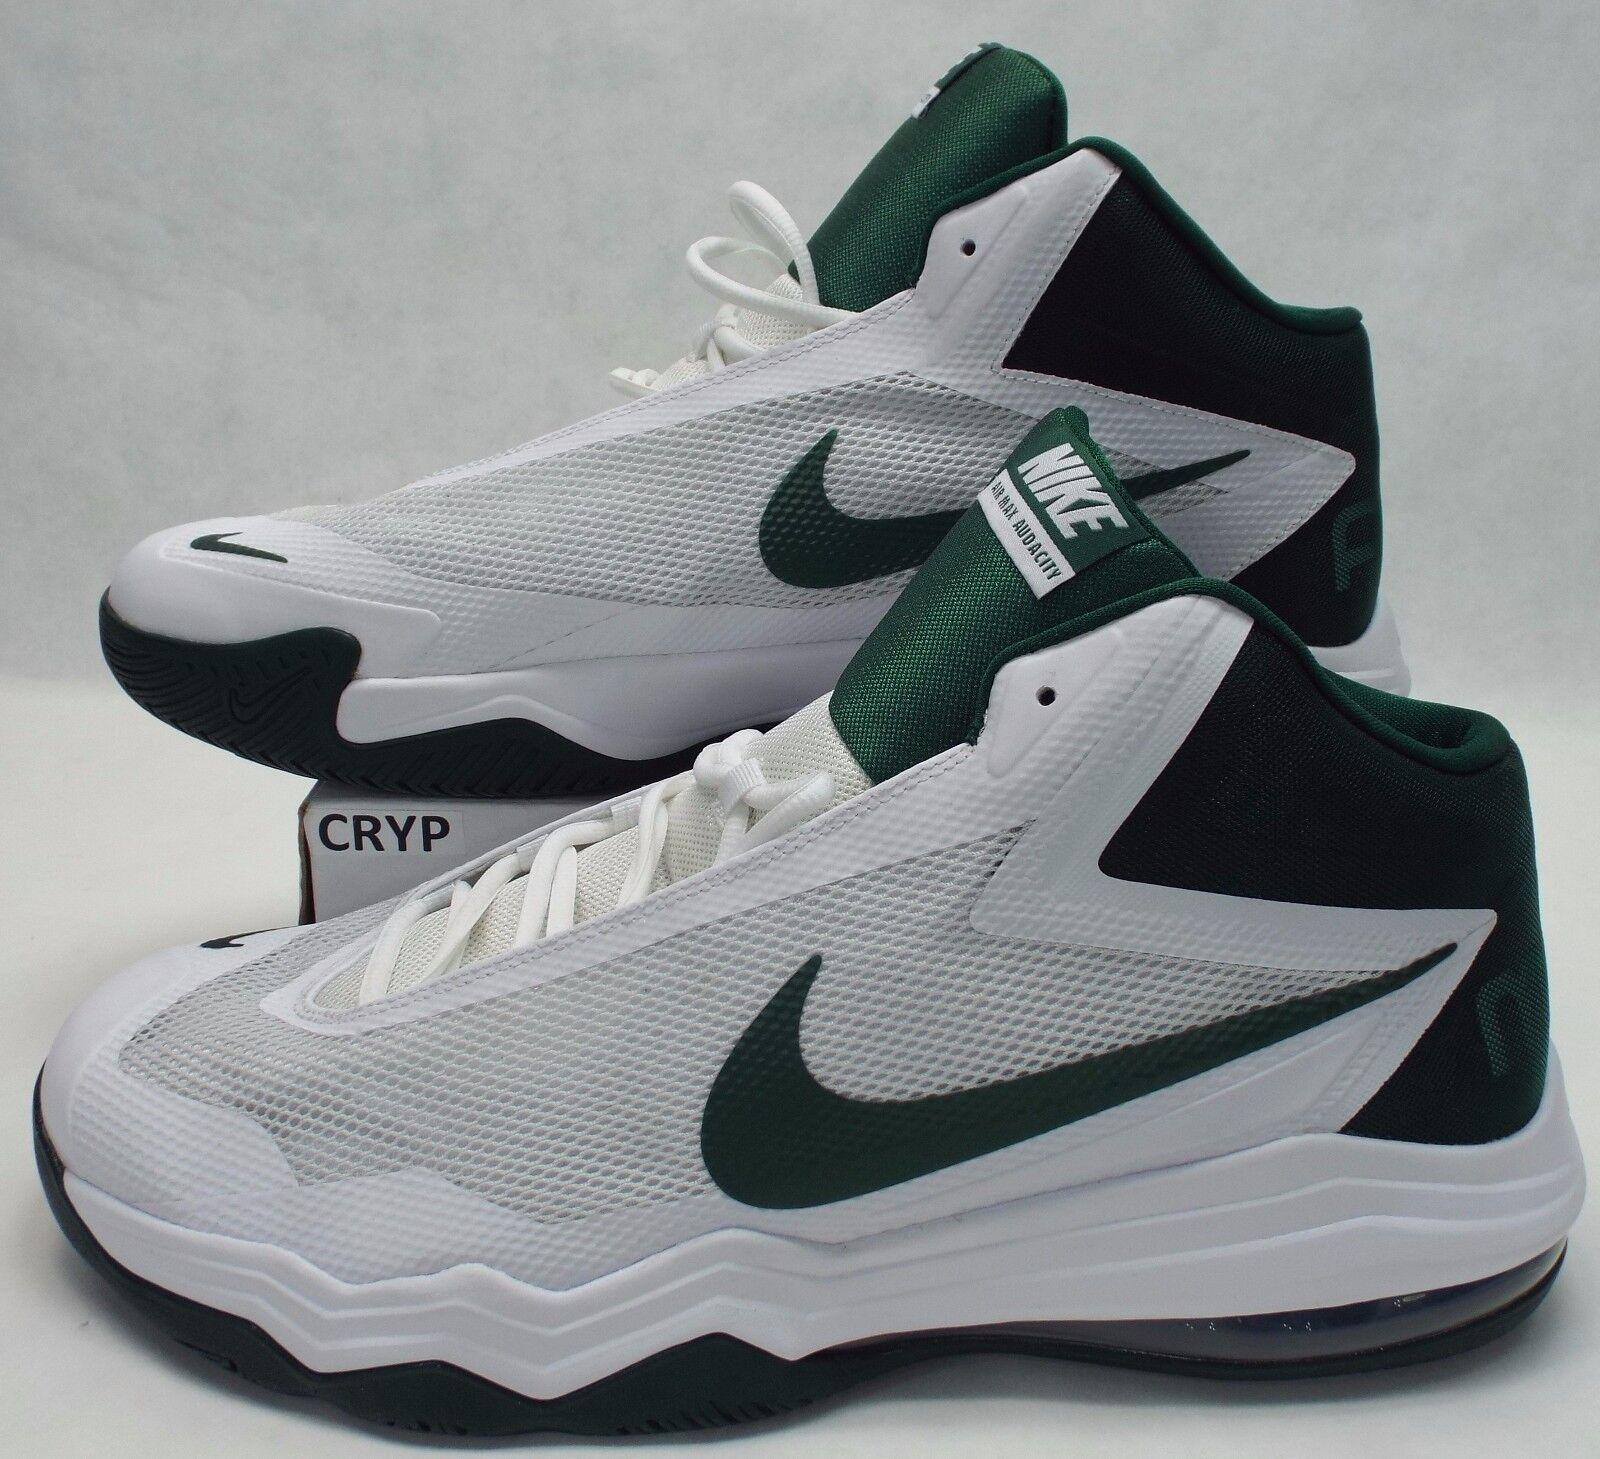 New Mens 17.5 NIKE Air Max Audacity White Green shoes  120 813318-130